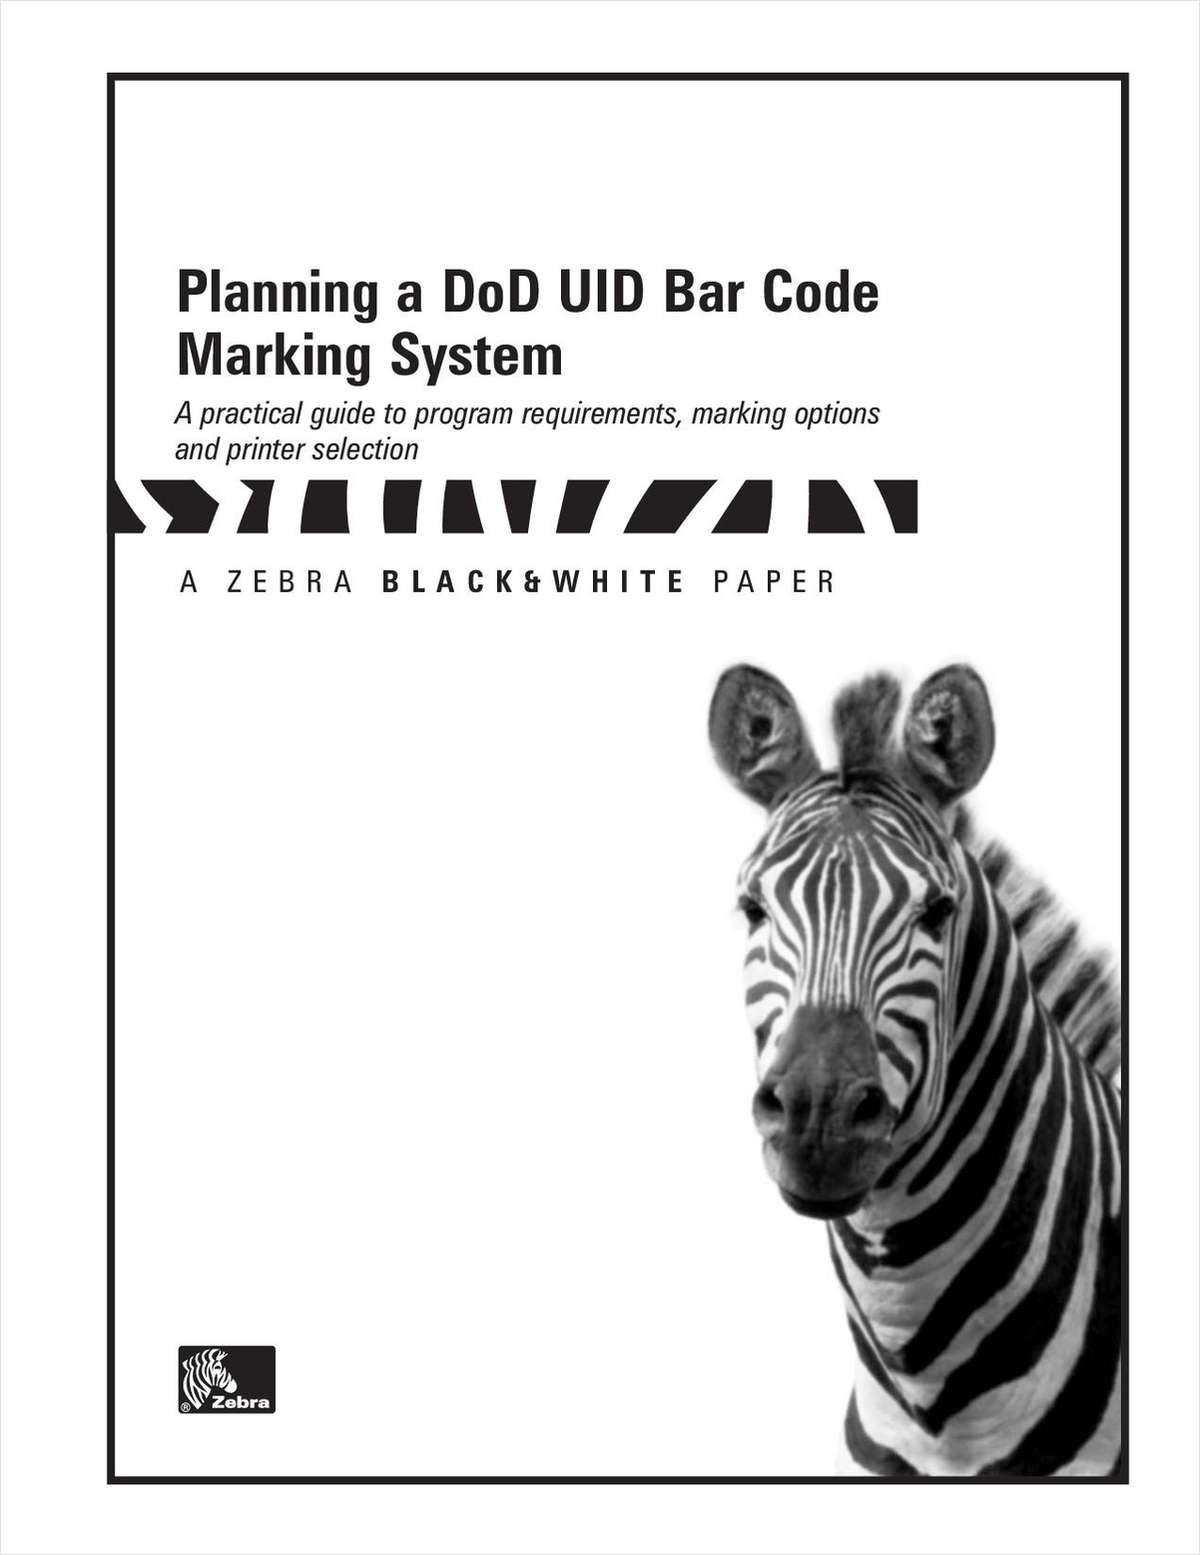 Planning a DoD UID Bar Code Marking System